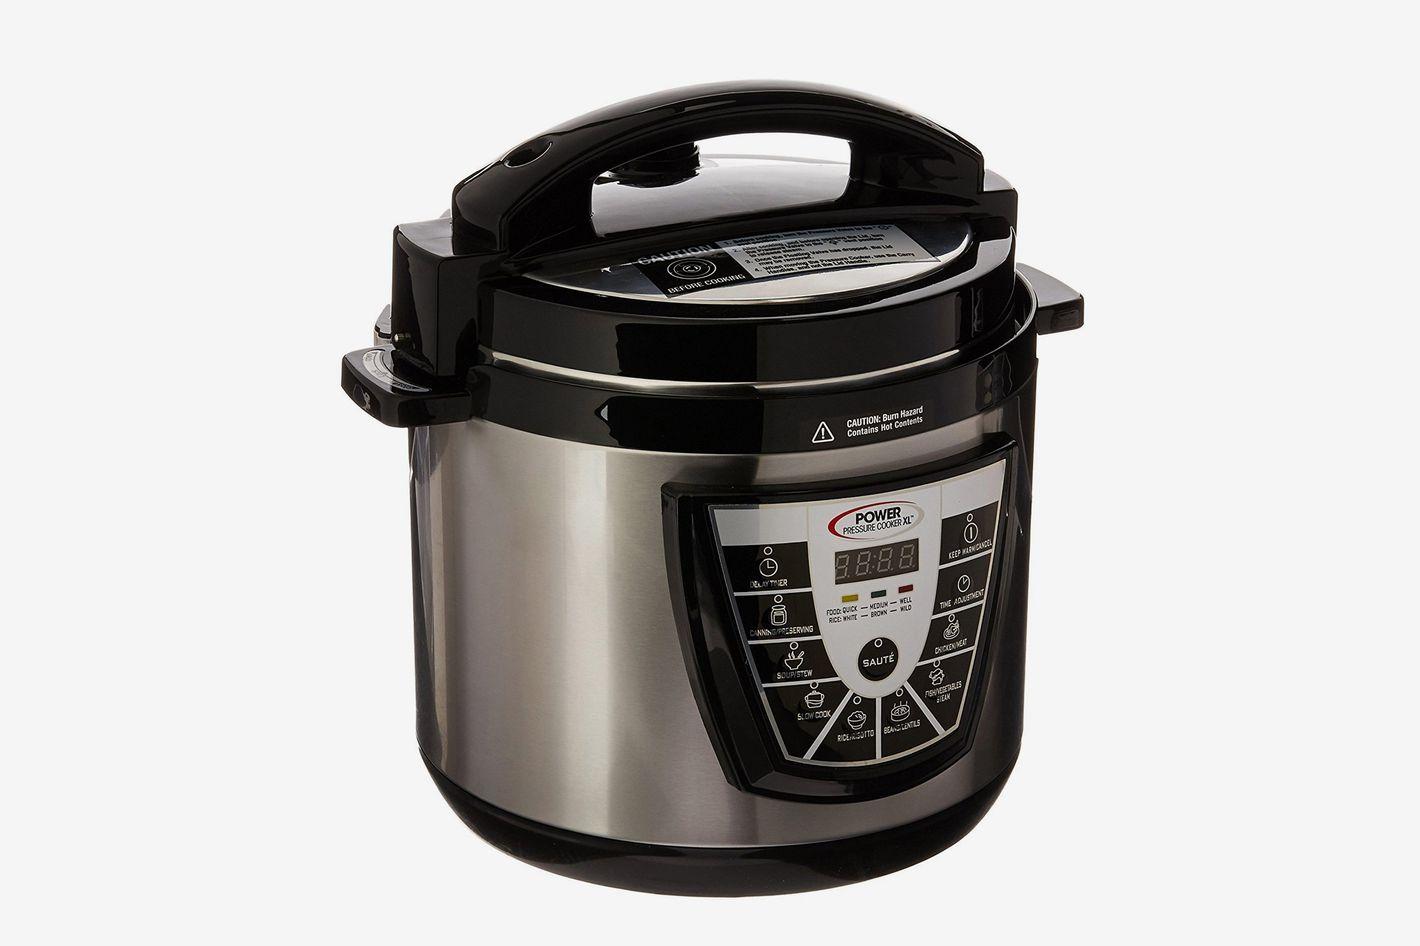 Power Pressure Cooker XL 8 Quart